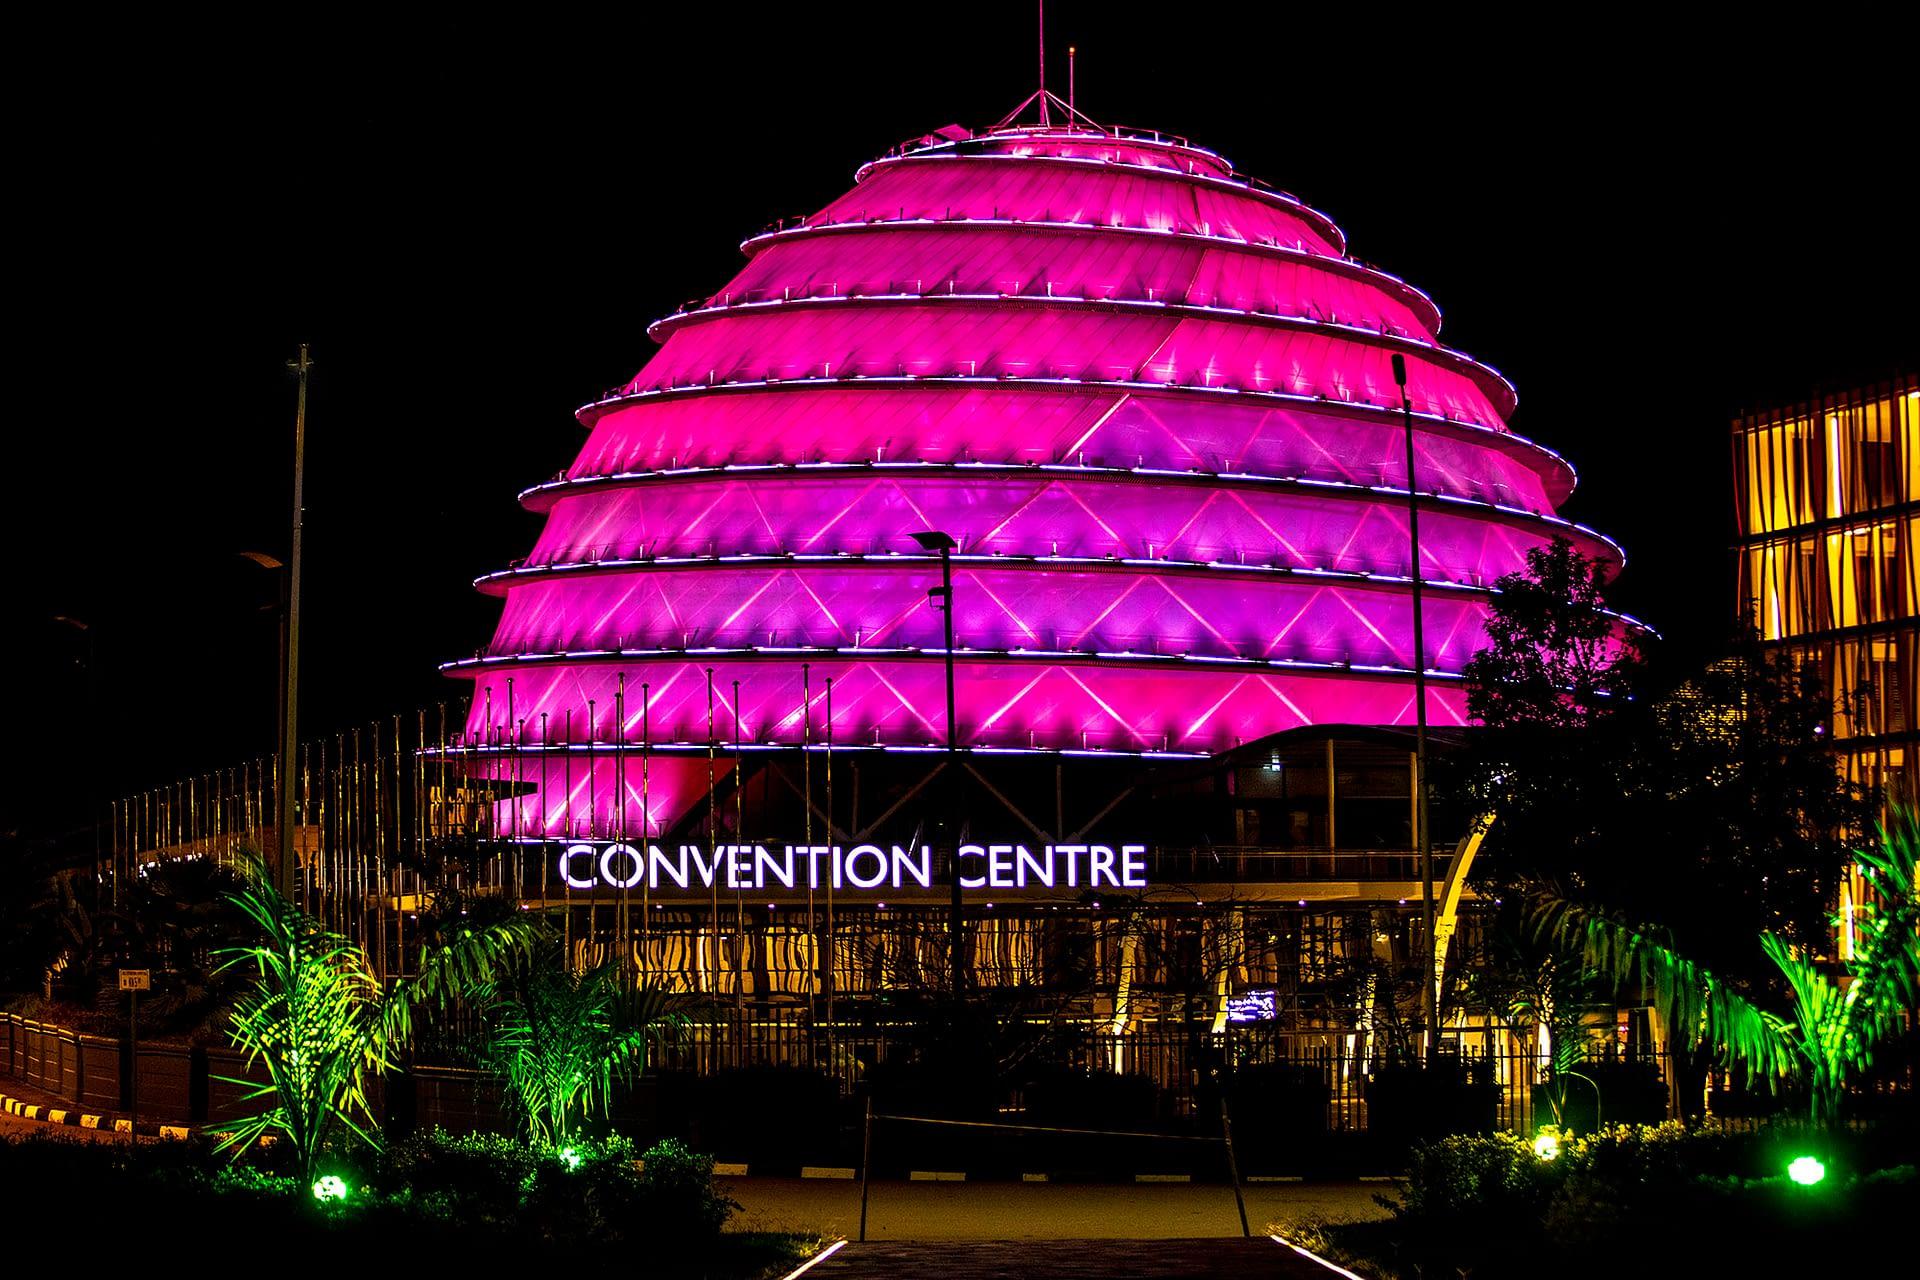 Kigali Convention Center, Rwanda